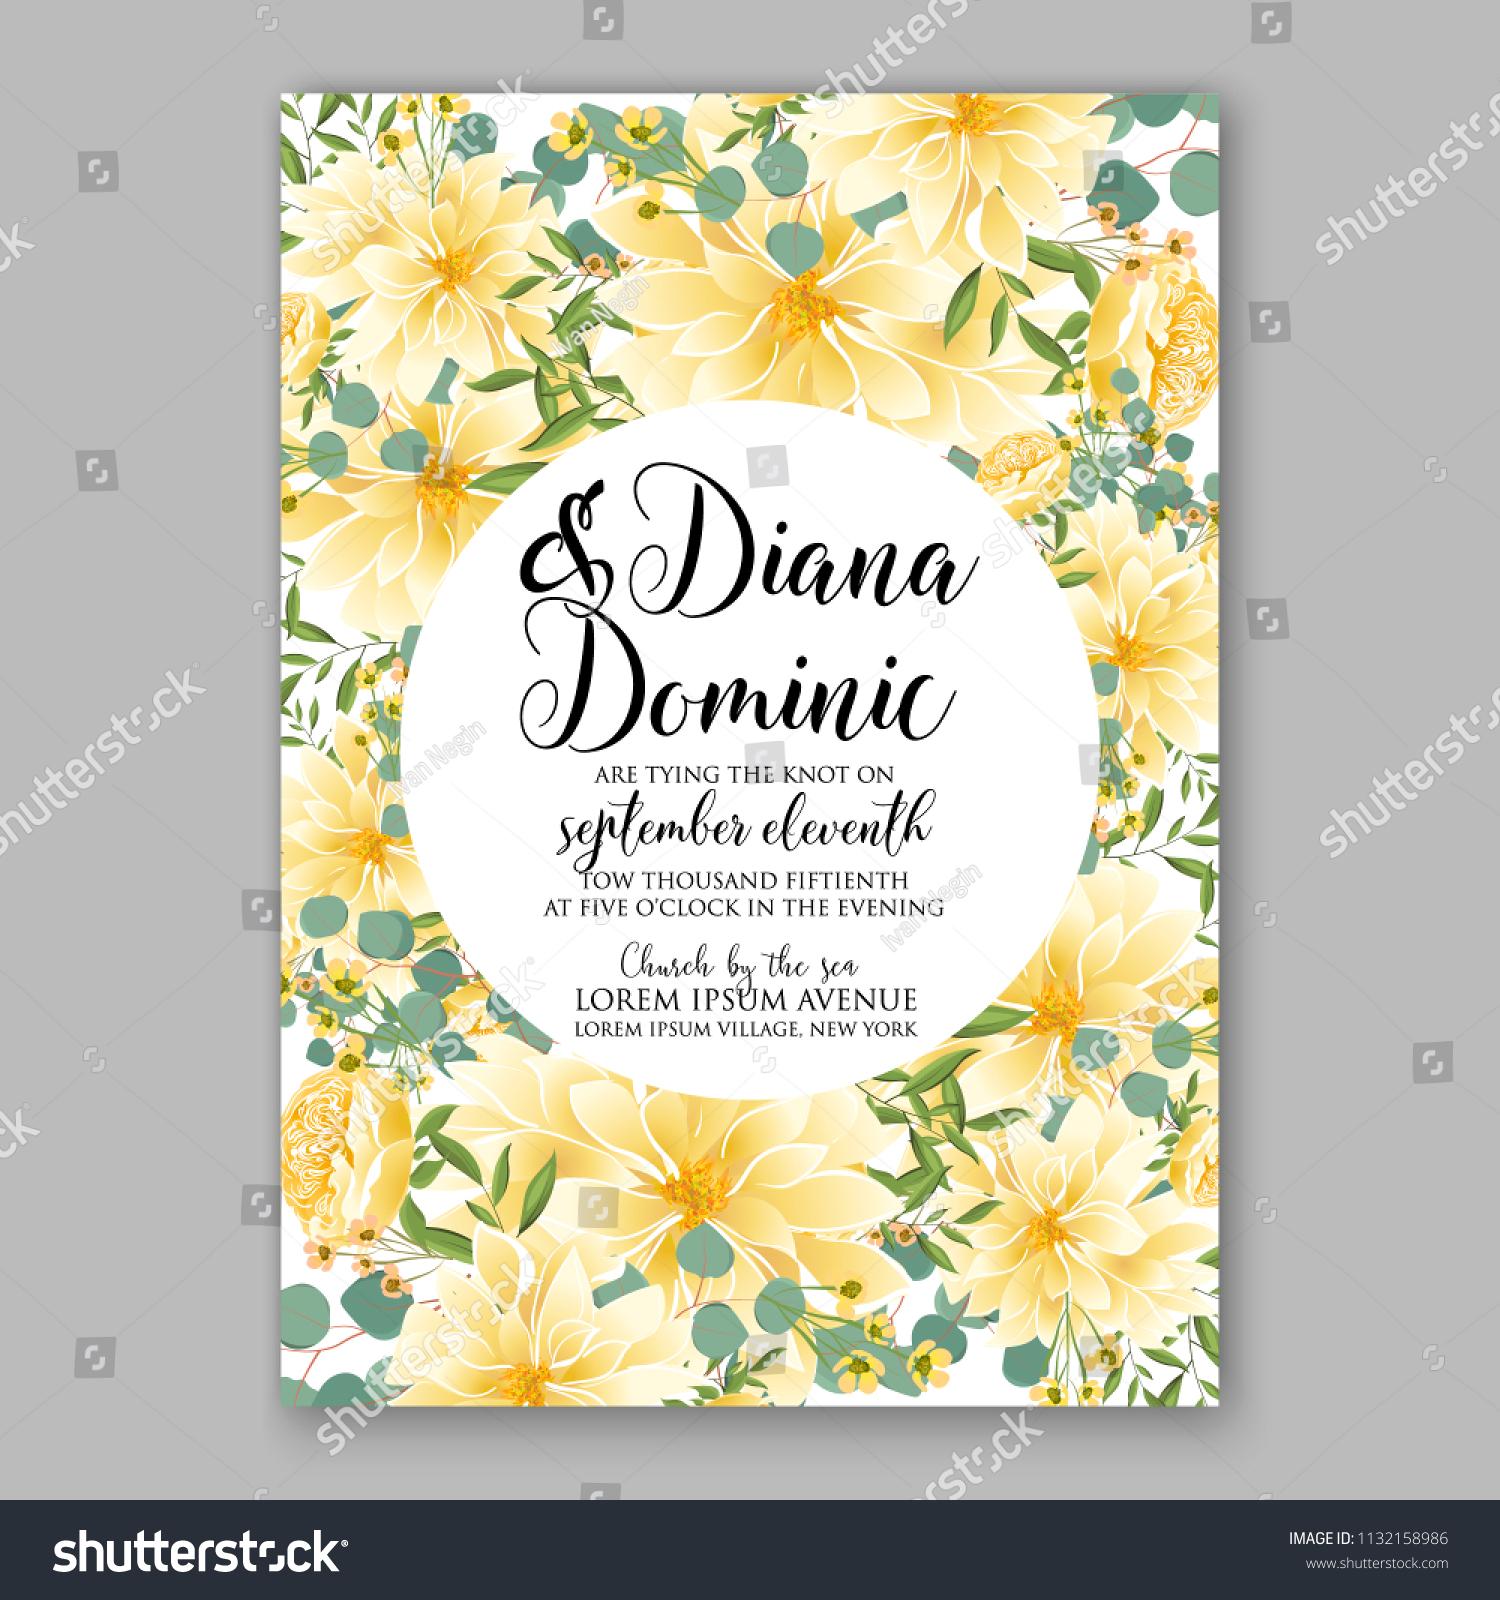 Floral Sunflower Wedding Invitation Greeting Card Stock Vector ...